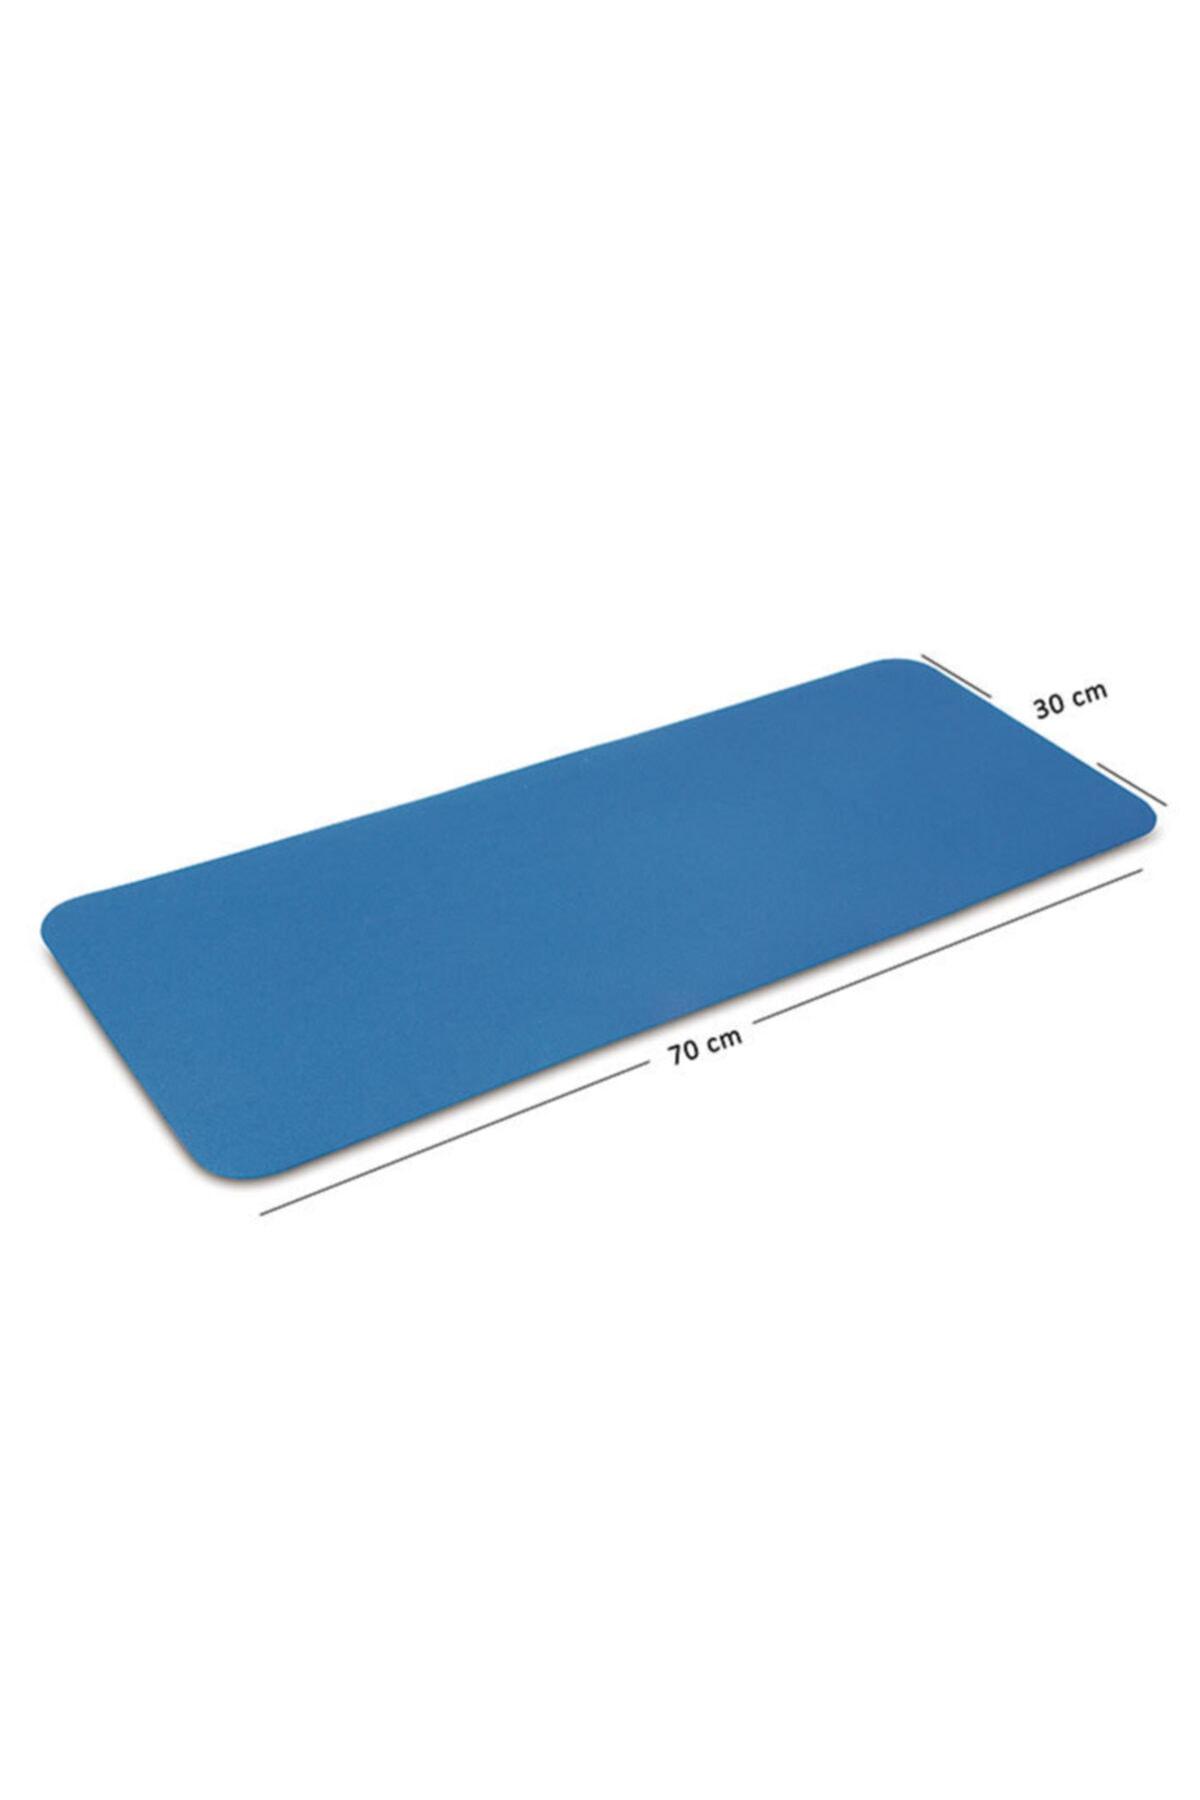 ADDISON 300271 Mavi 300*700*3mm Oyuncu Uzun Mouse Pad 2